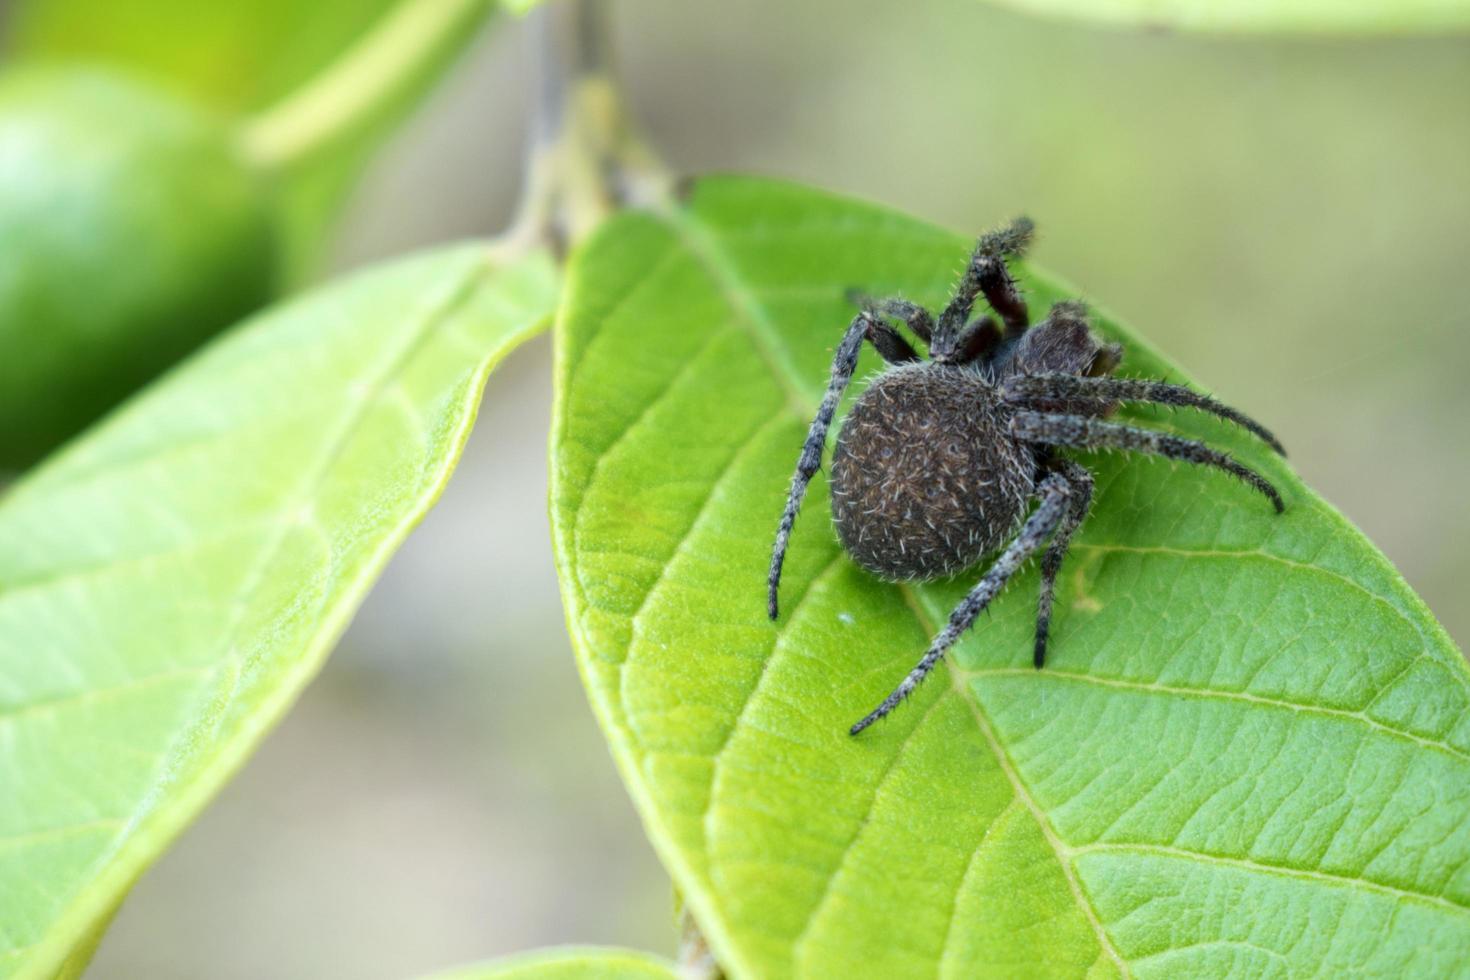 Close-up of spider on leaf photo